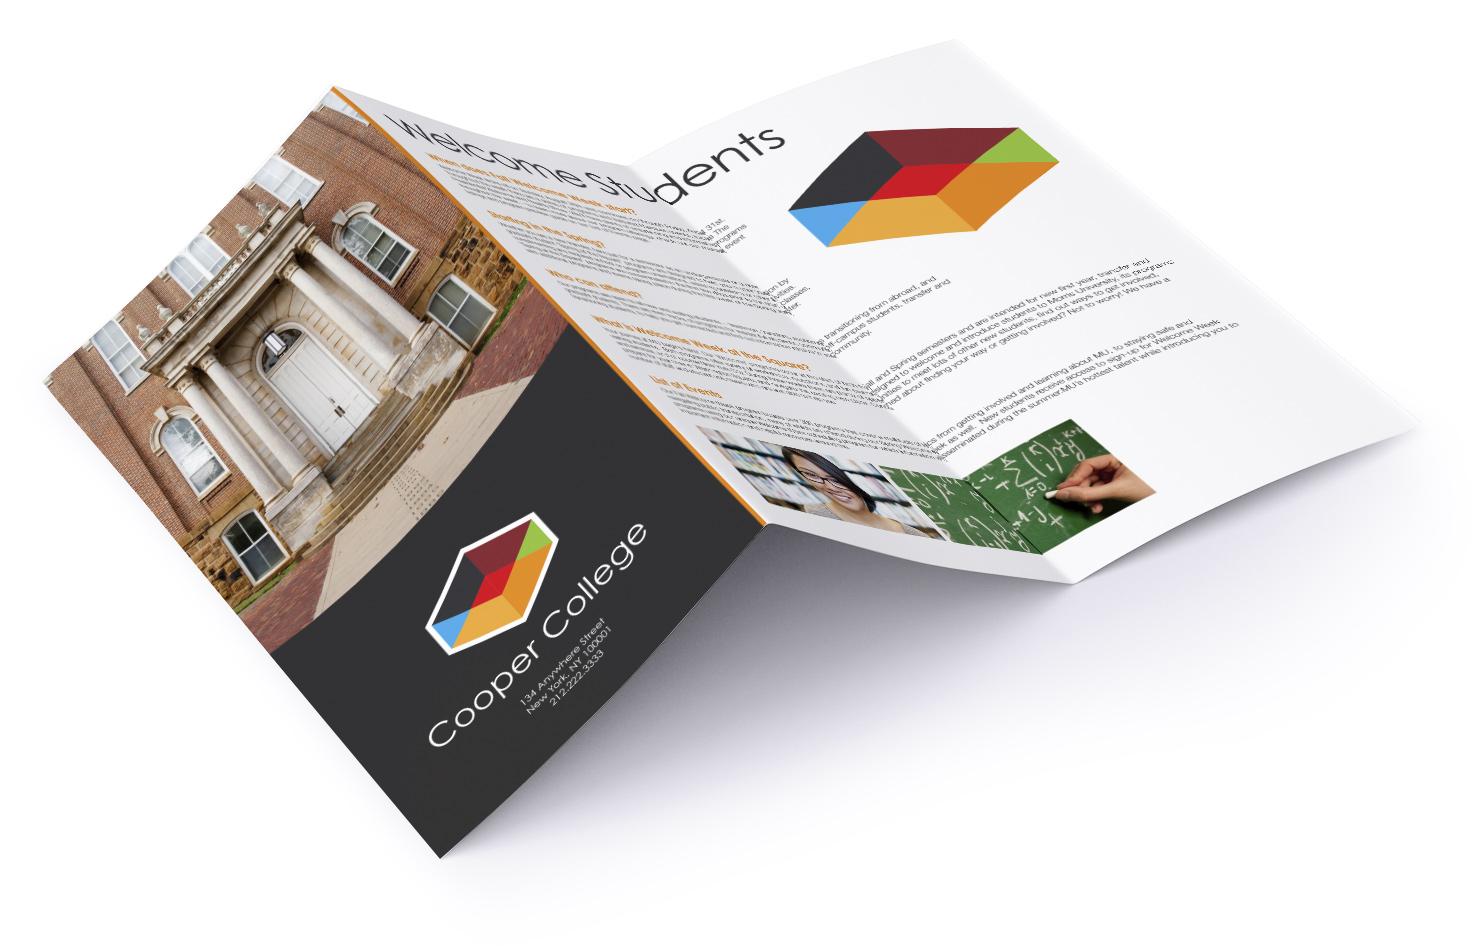 Cooper_College_Education-Trifold_Brochur